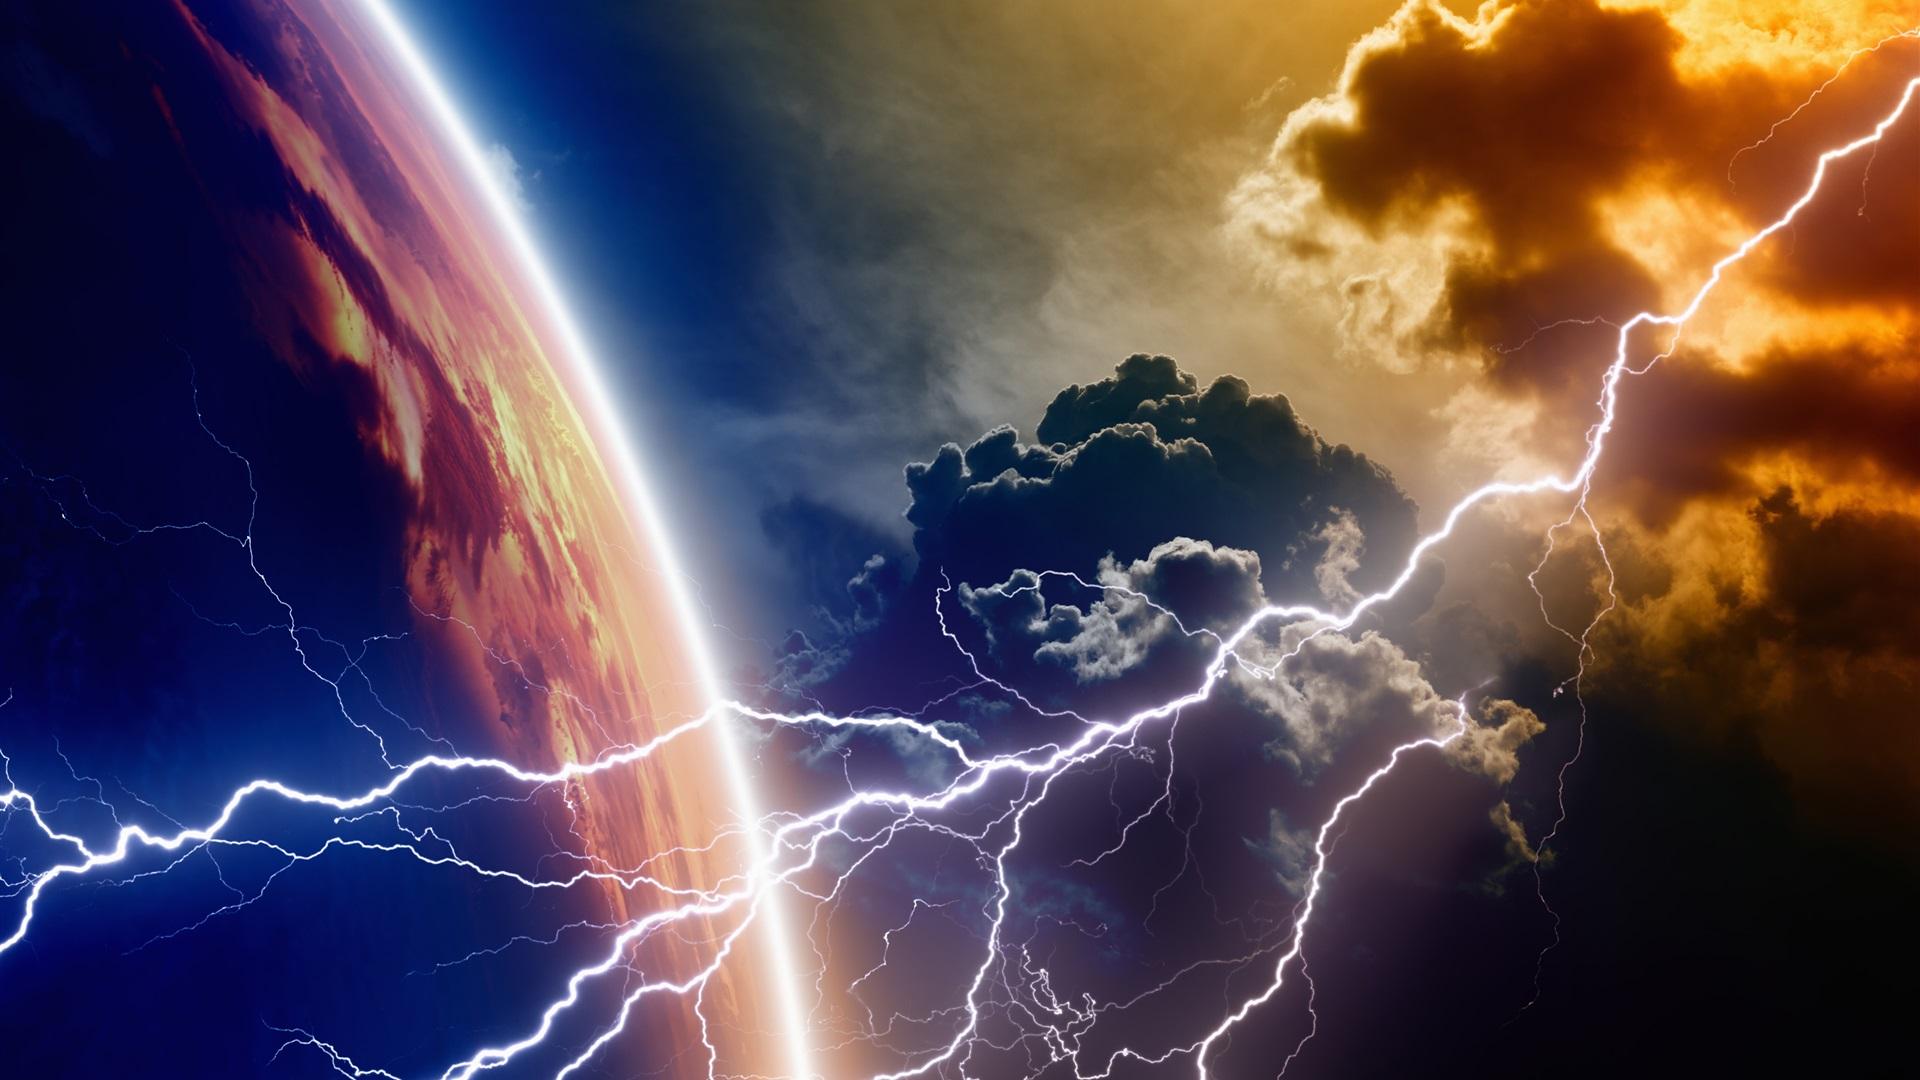 Wallpaper planet clouds lightning 3840x2160 uhd 4k picture image - Lightning wallpaper 4k ...